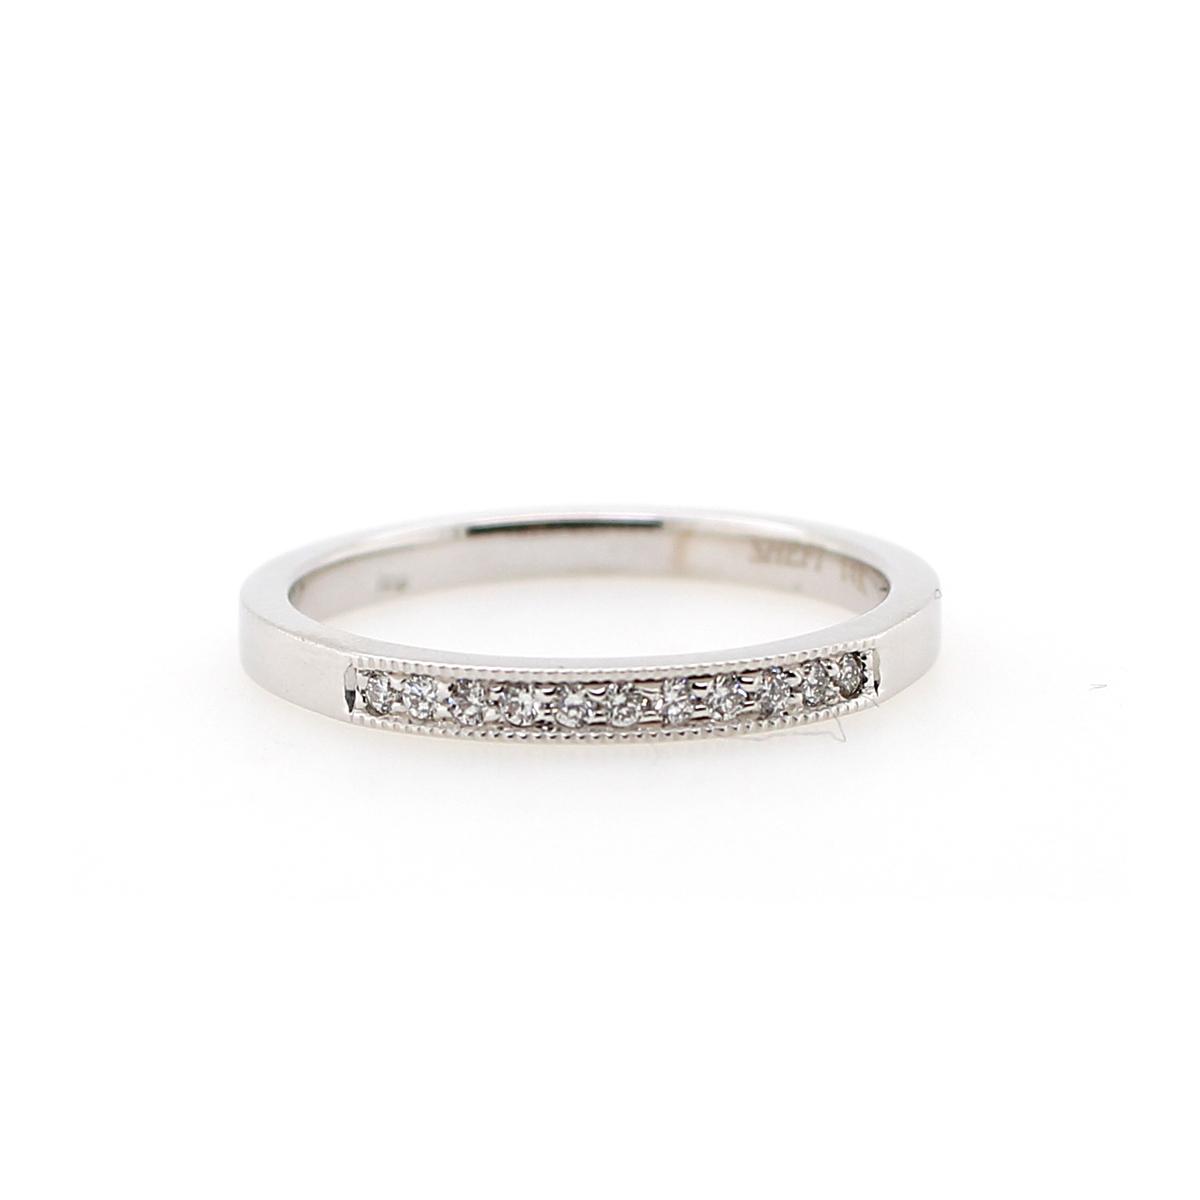 Shefi Diamonds 14 Karat White Gold .1 Carat Millgrain Edge Wedding Band